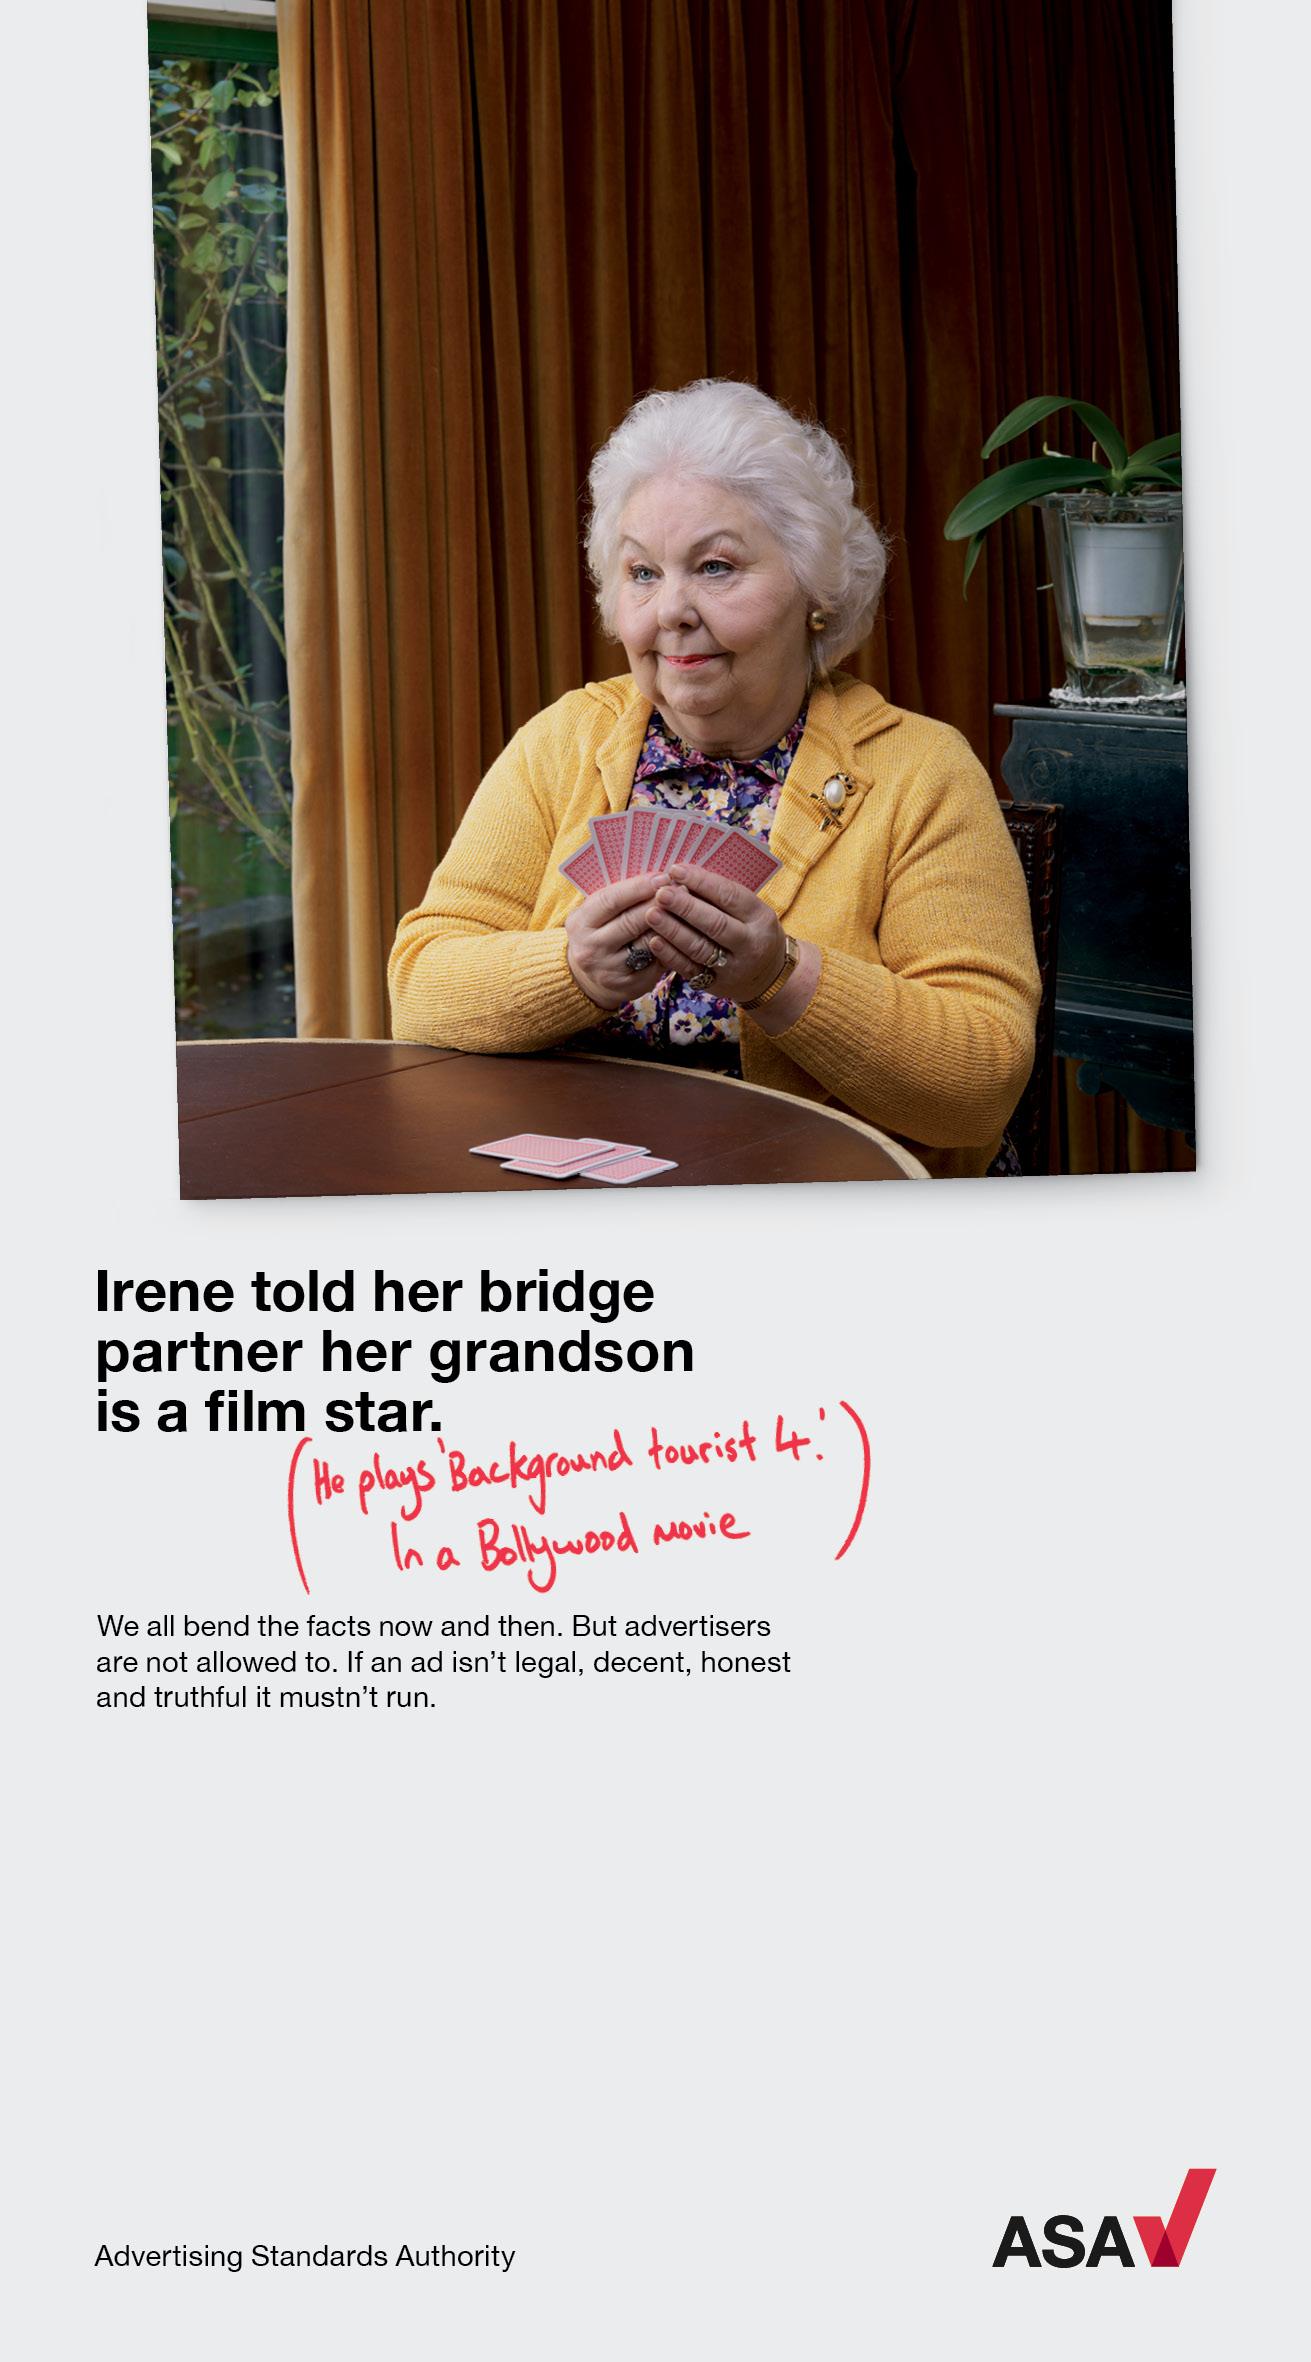 Irene ASA ad campaign 2015.jpg